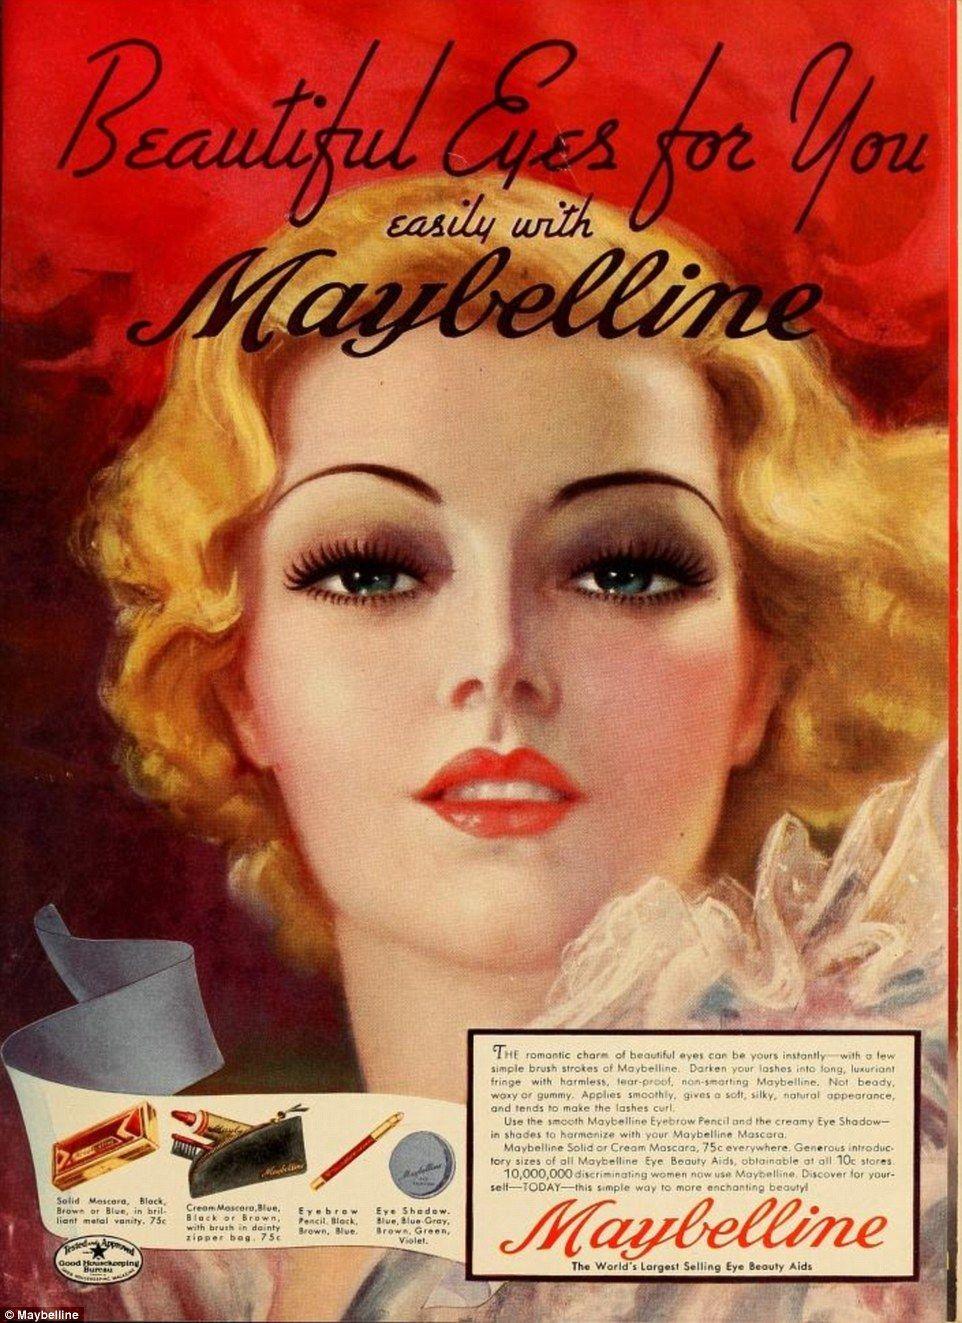 100yearold makeup ads show women's beauty needs have